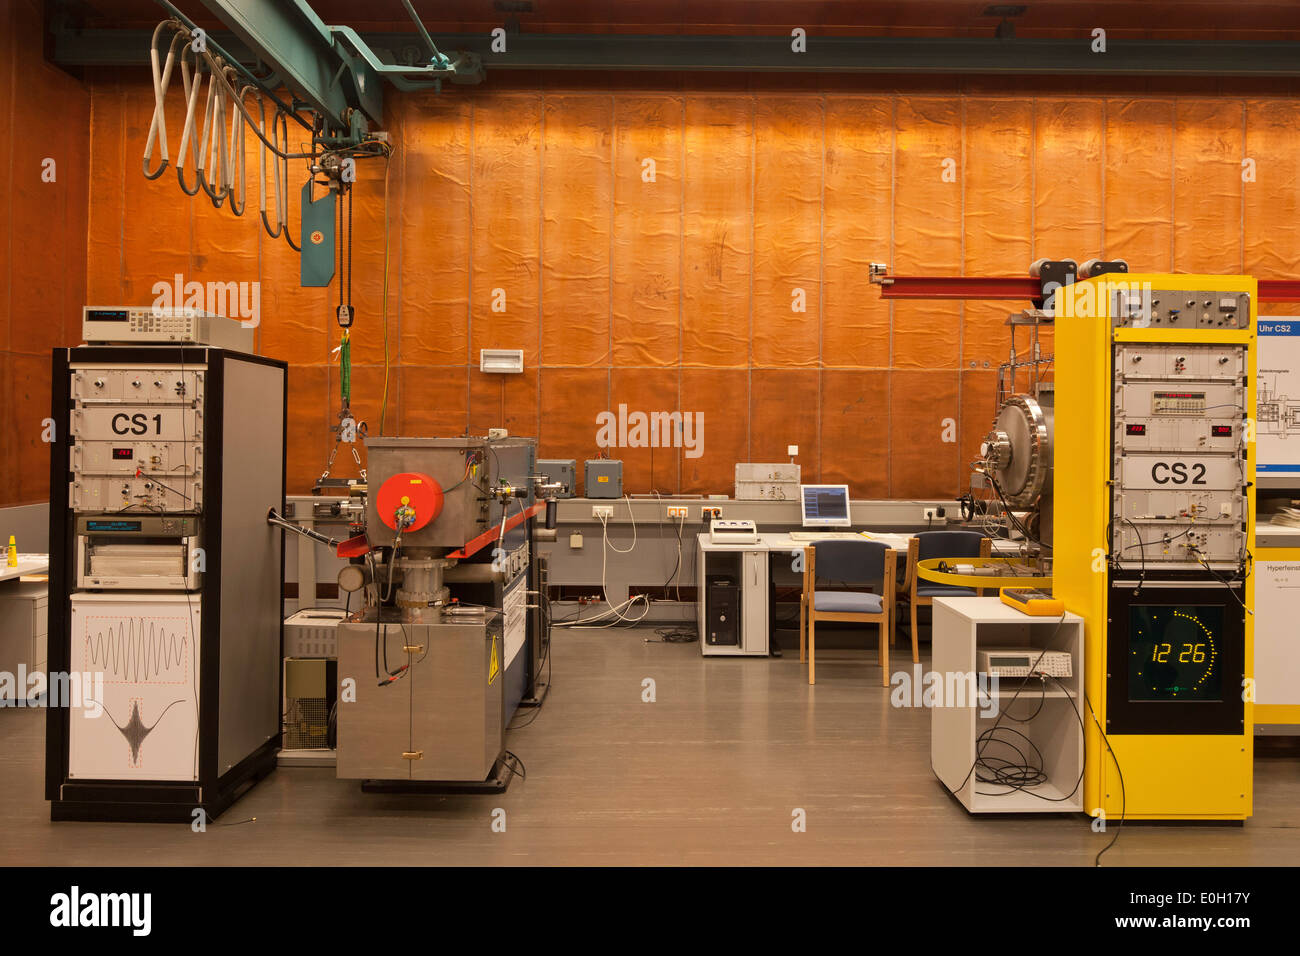 Caesium atomic clocks from the PTB institute, Lower Saxony, Germany, Brunswick, Lower Saxony, Germany - Stock Image